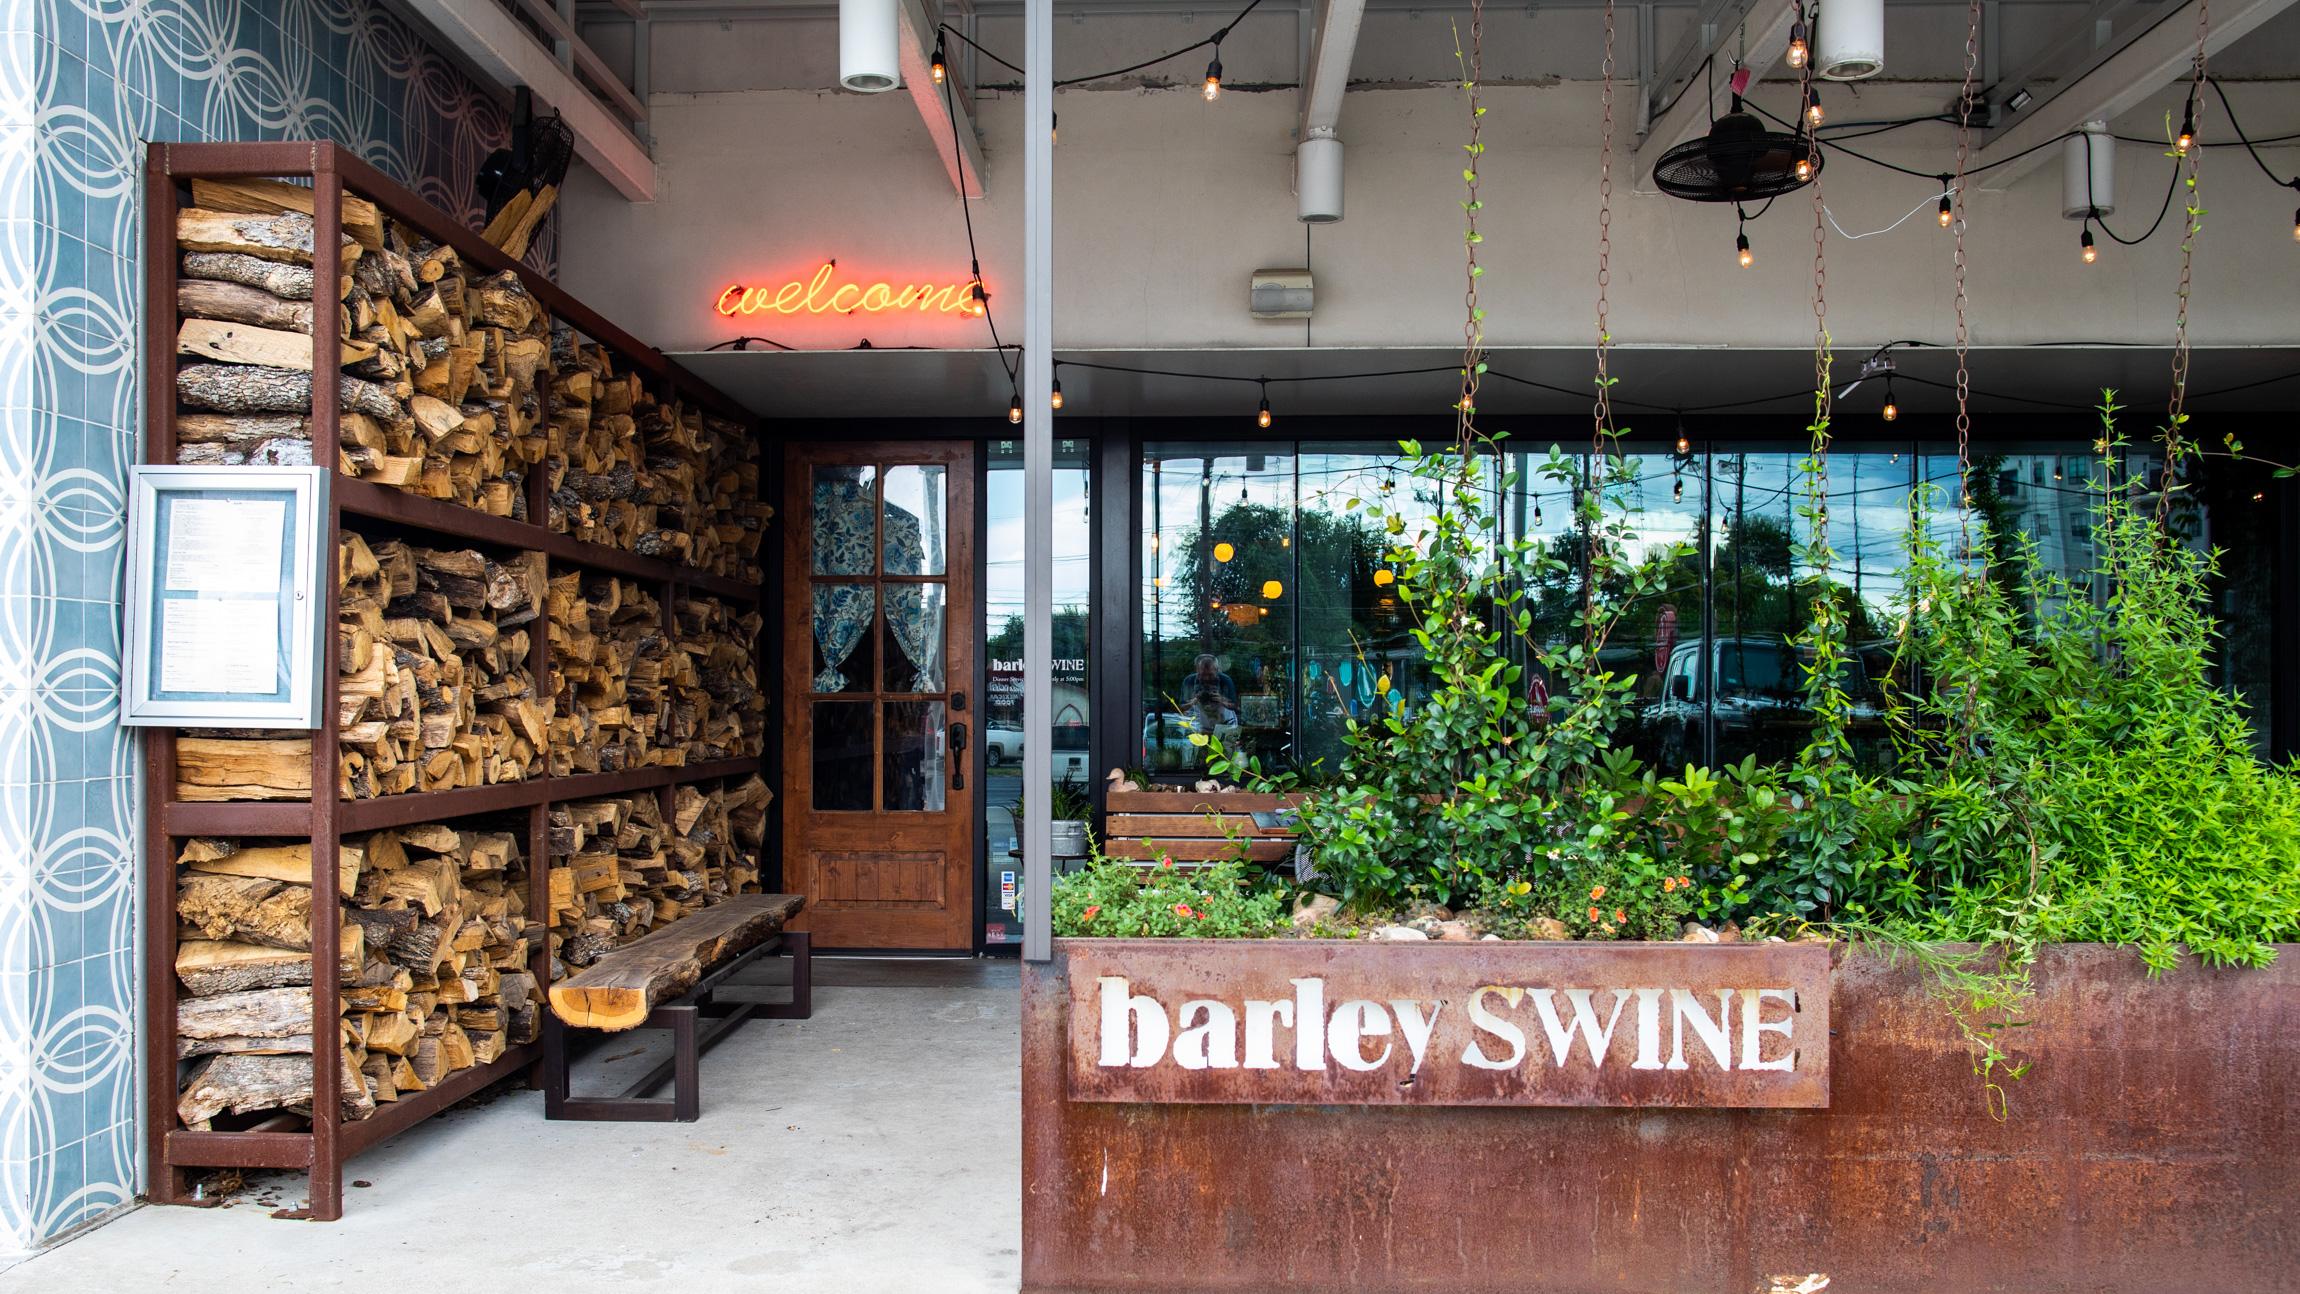 Portrait of Barley Swine